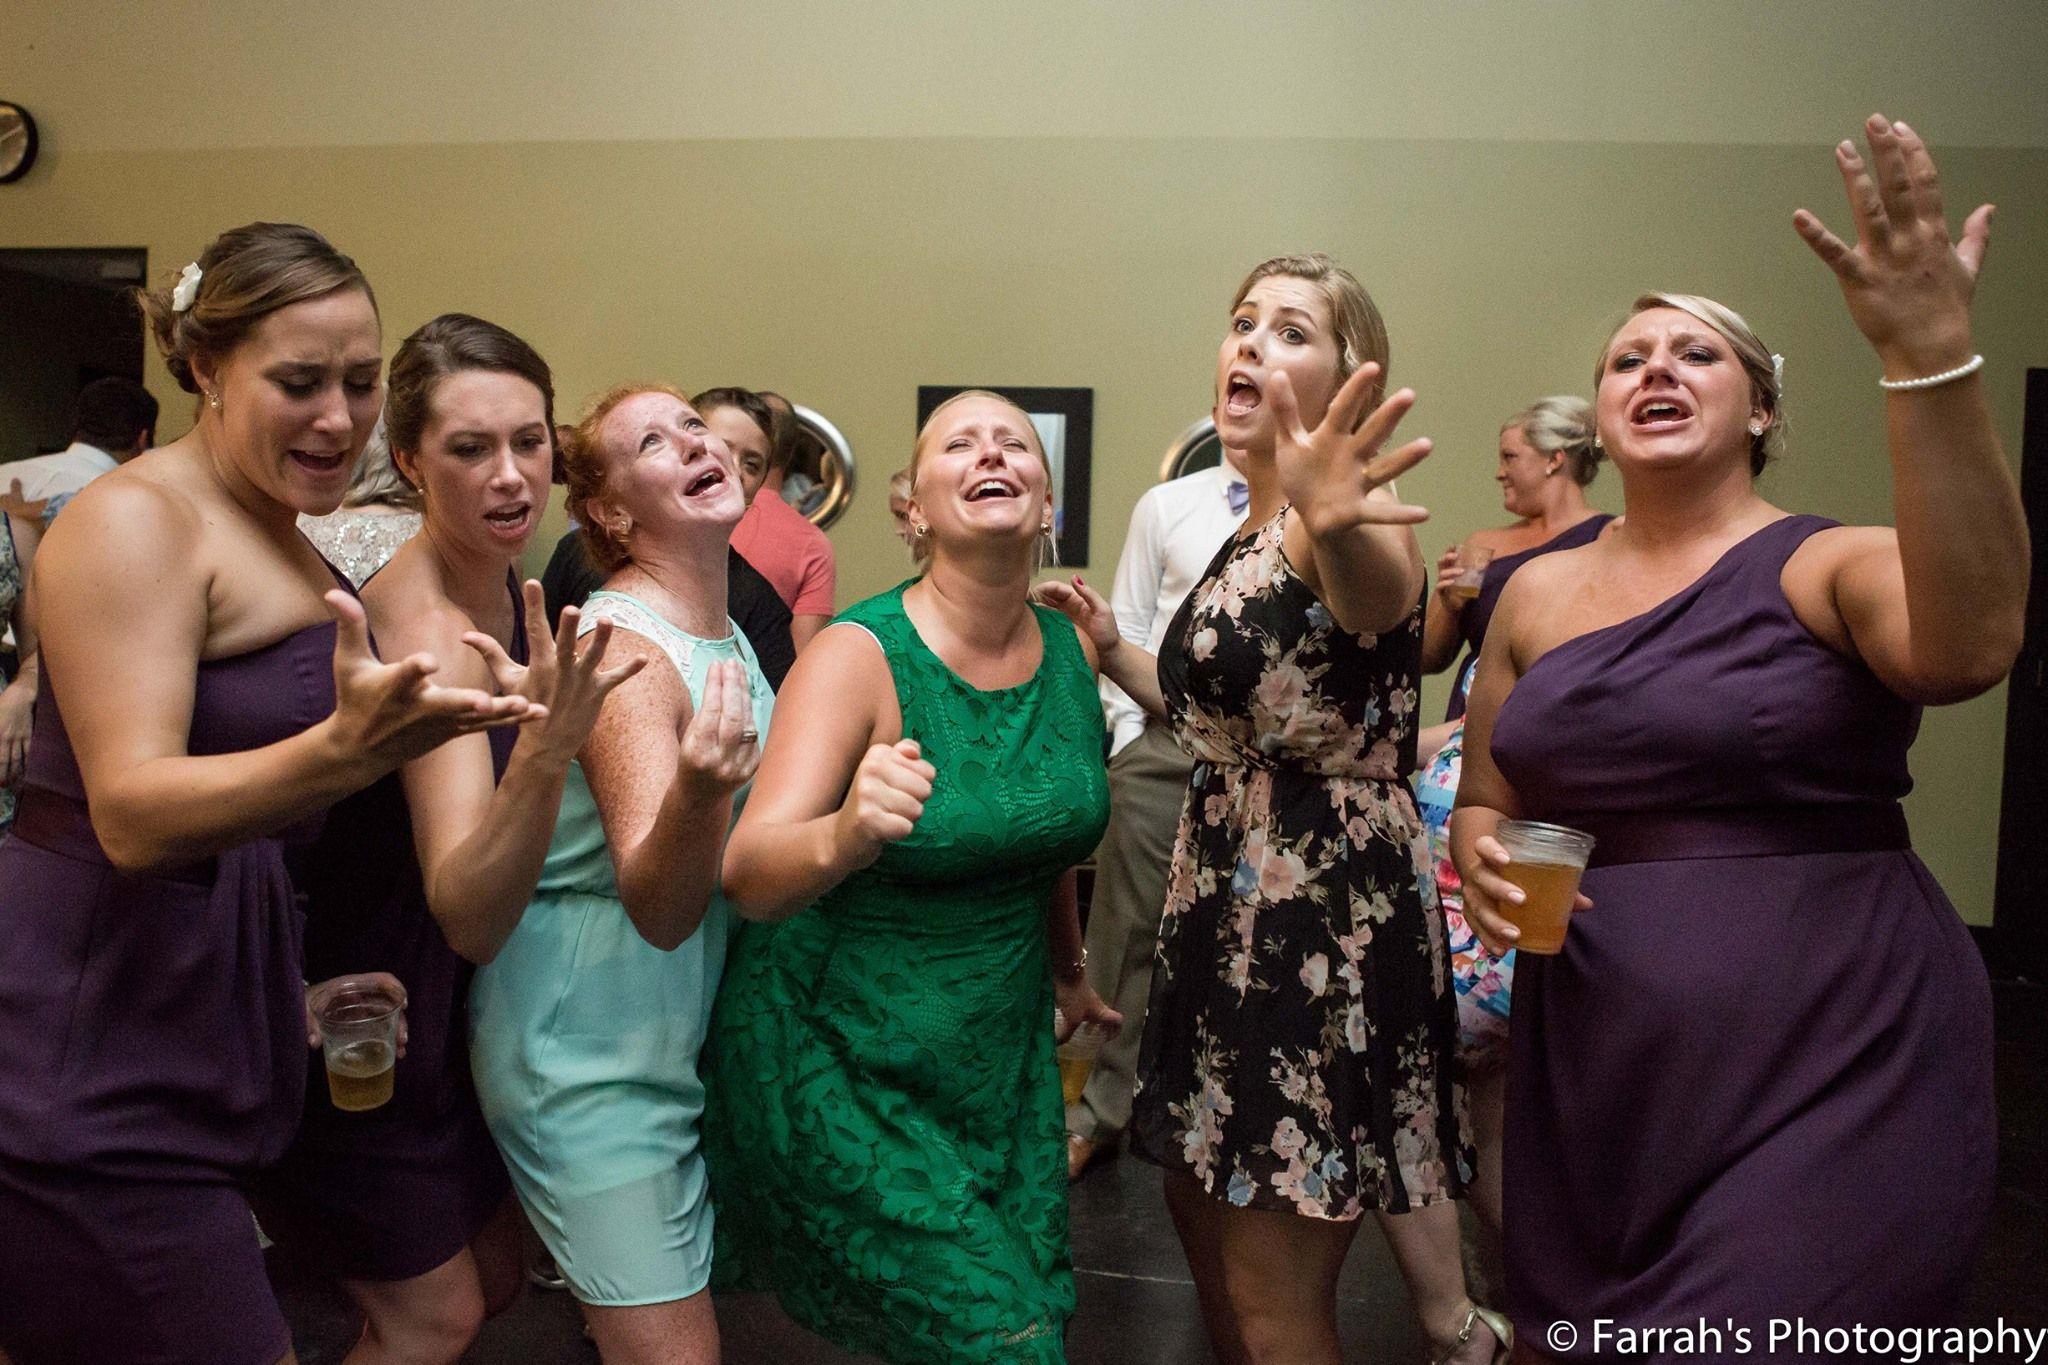 www.farrahsphotography.net #ReceptionFun #SingItGirls #FarrahsPhotography #HavingABlast